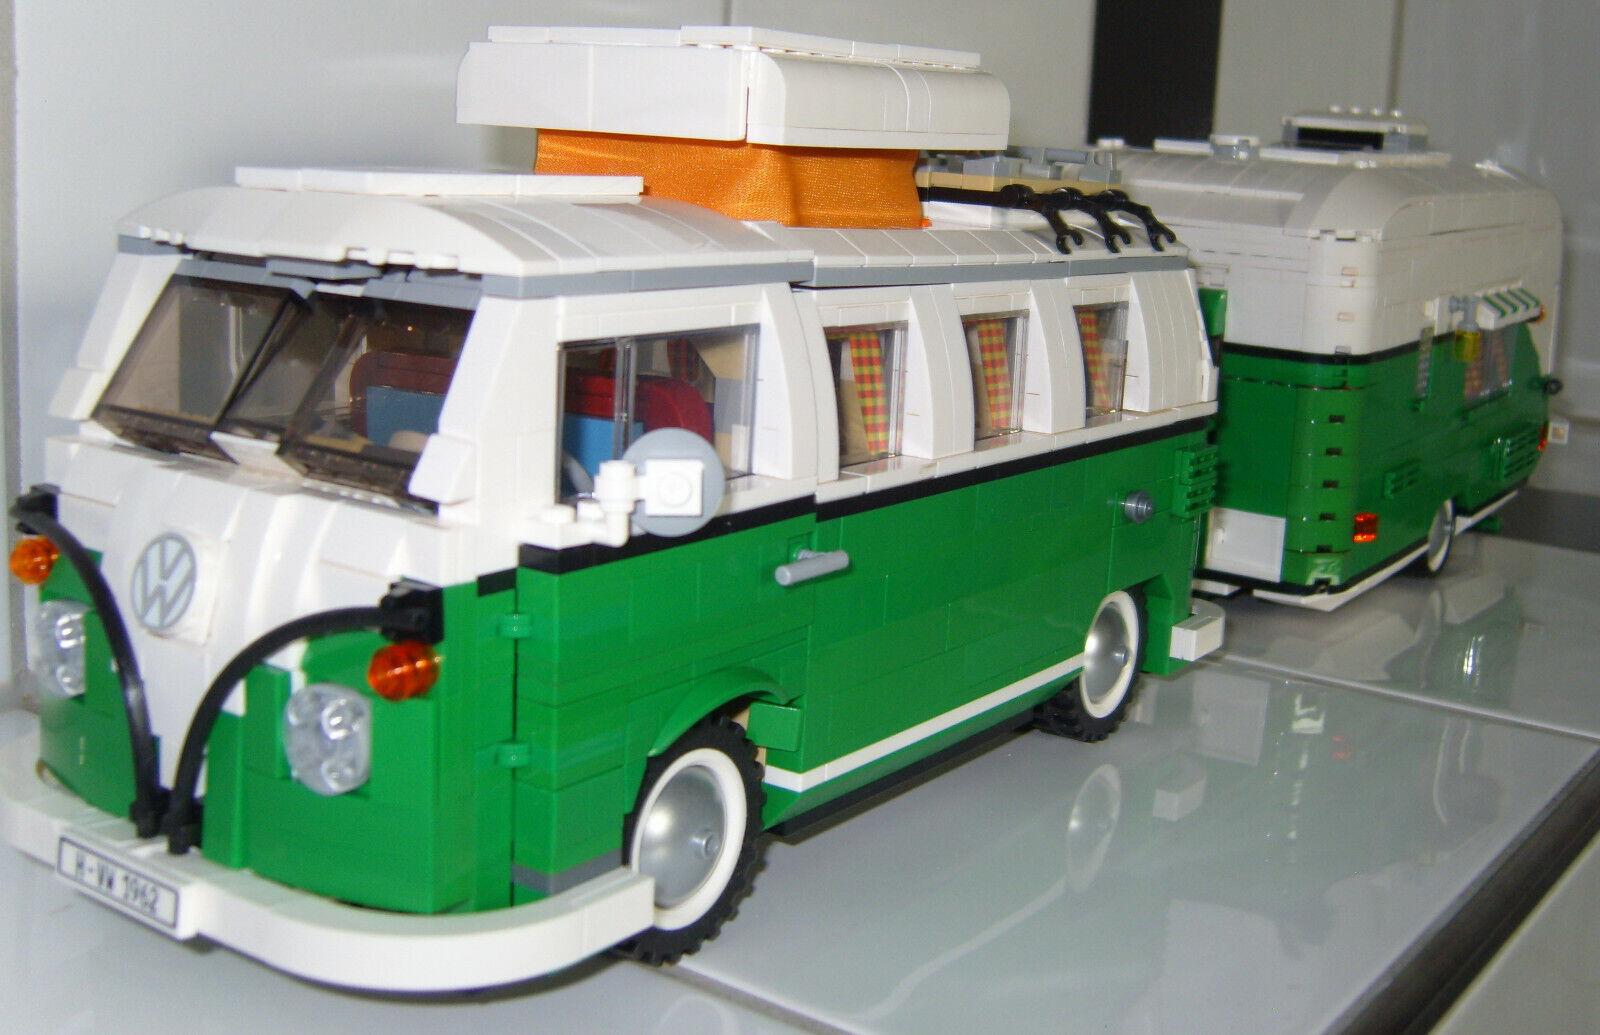 2.864 LEGO TECHNIC ELESieTE + KLEMMBAUSTEINE -  TECHNIK MOC EIGENBAU UNIKAT TOP